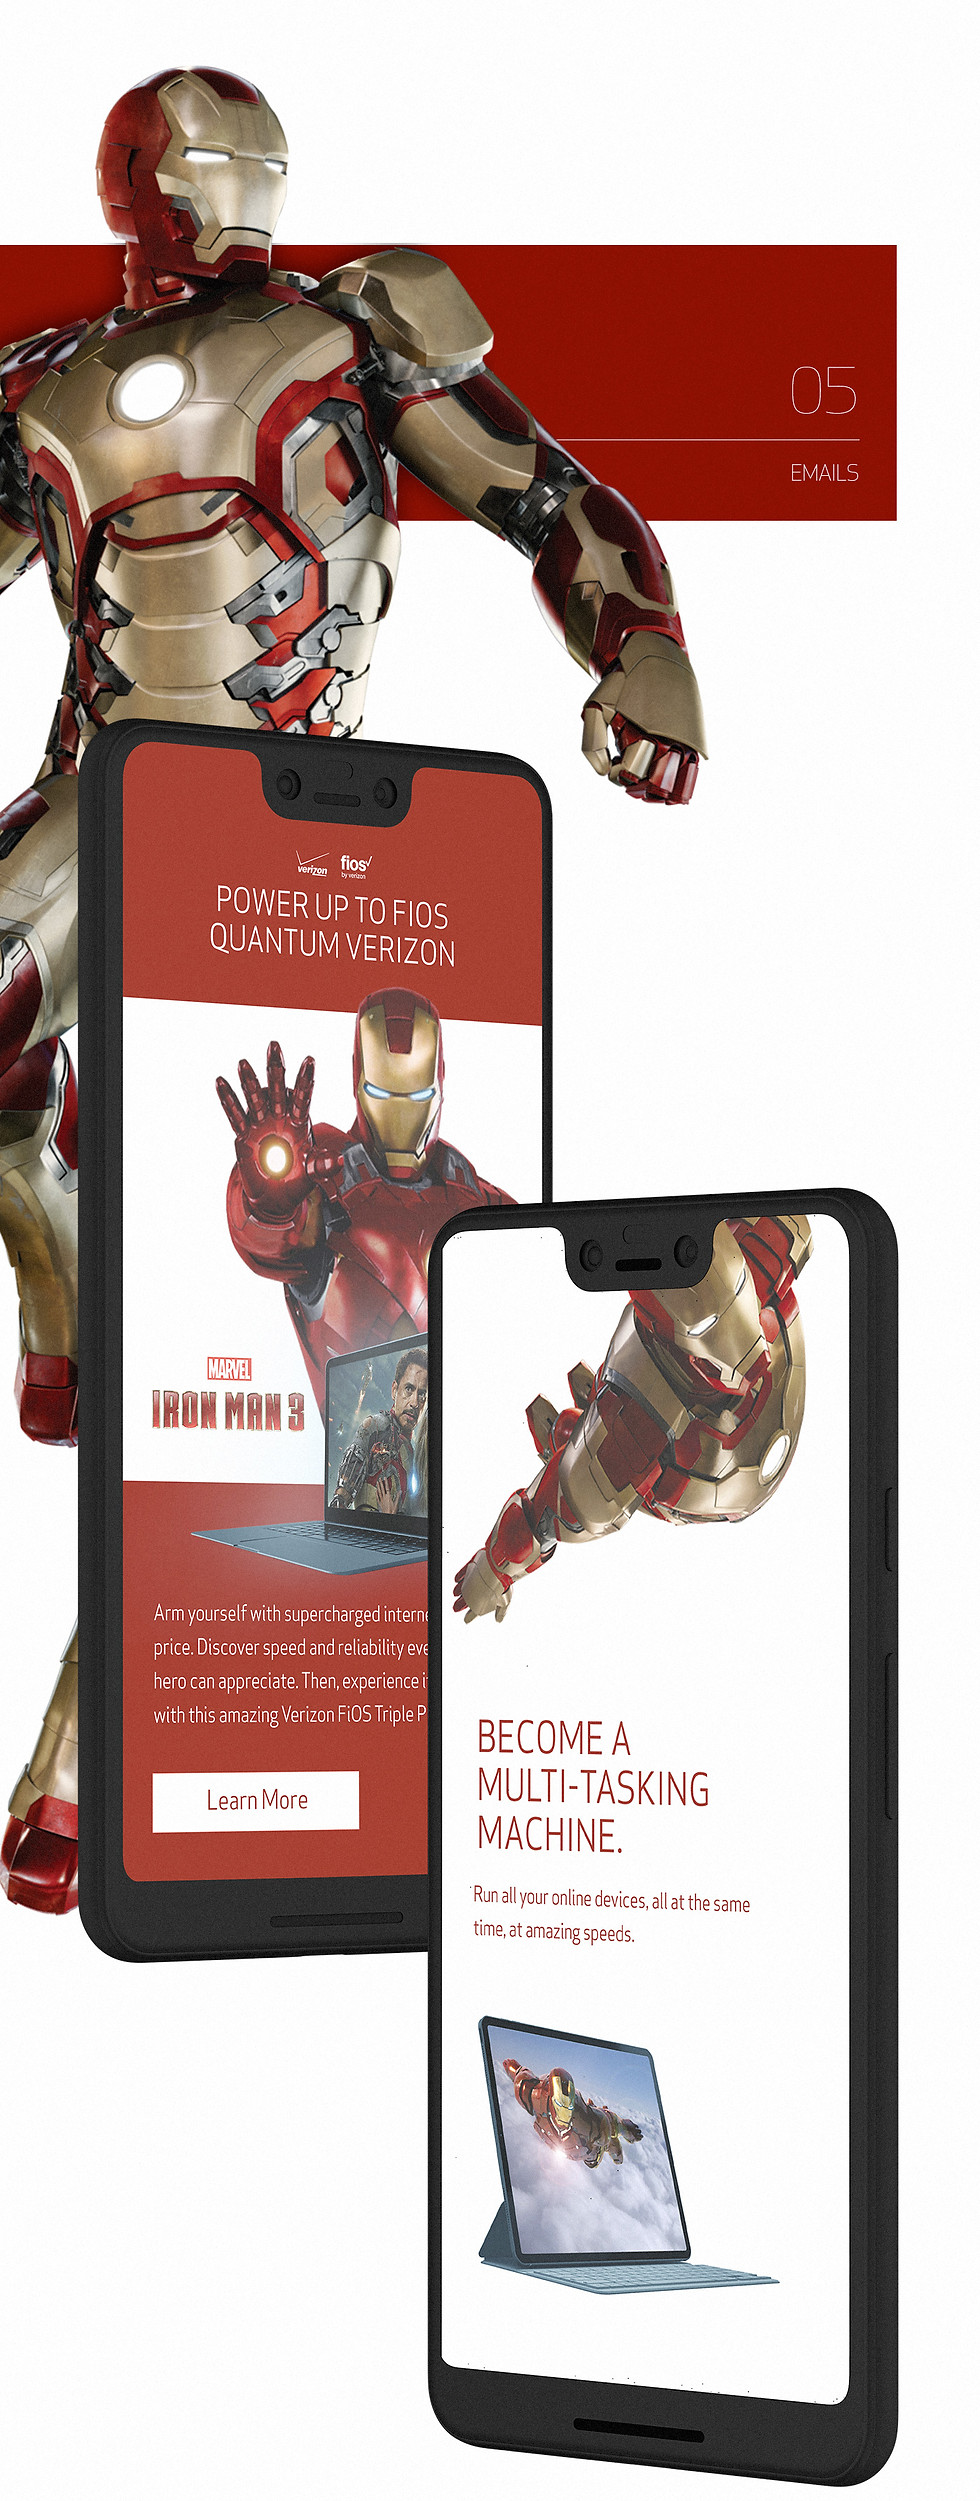 Verizon_Iron_Man_Campaign_113019_Web_11.